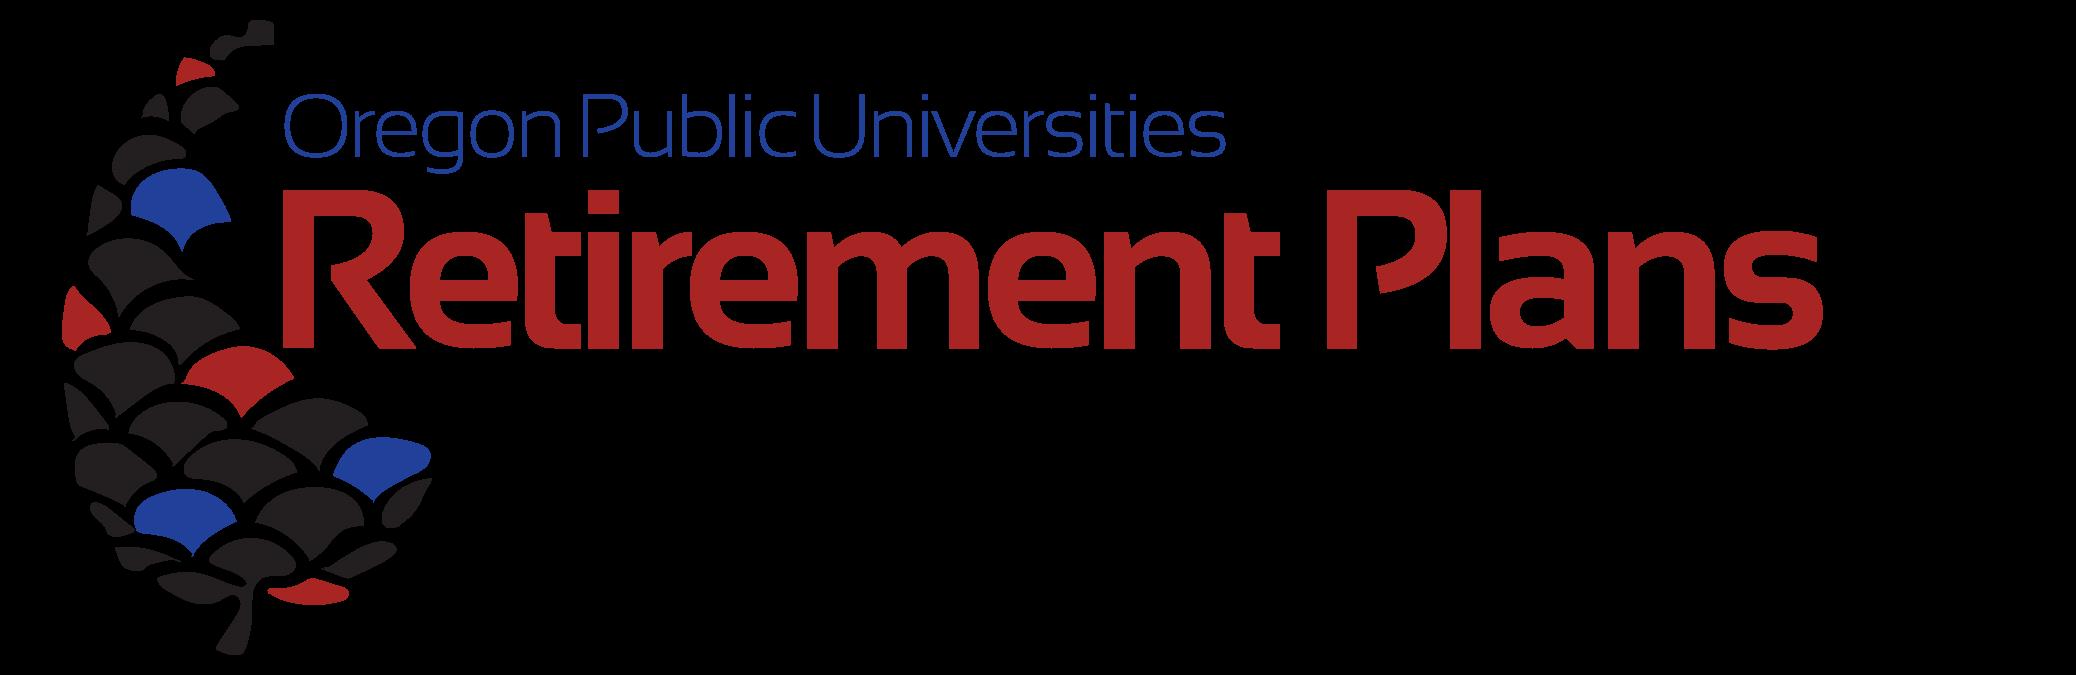 2076x675 Oregon Public Universities Retirement Programs University Of Oregon